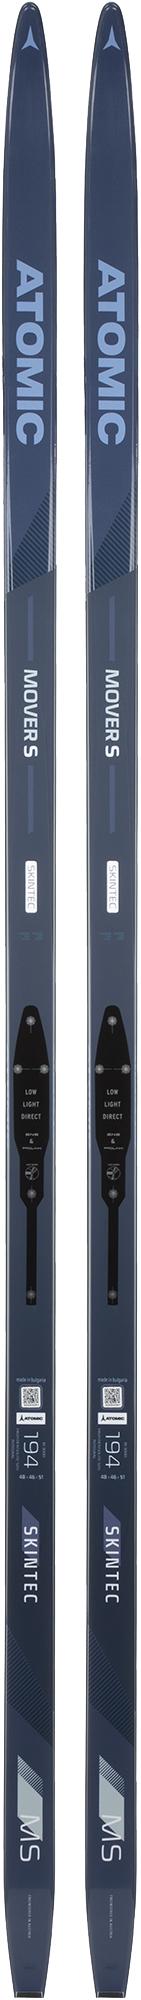 Atomic Беговые лыжи Atomic Mover Skintec, размер 204 sperling michael atomic absorption spectrometry